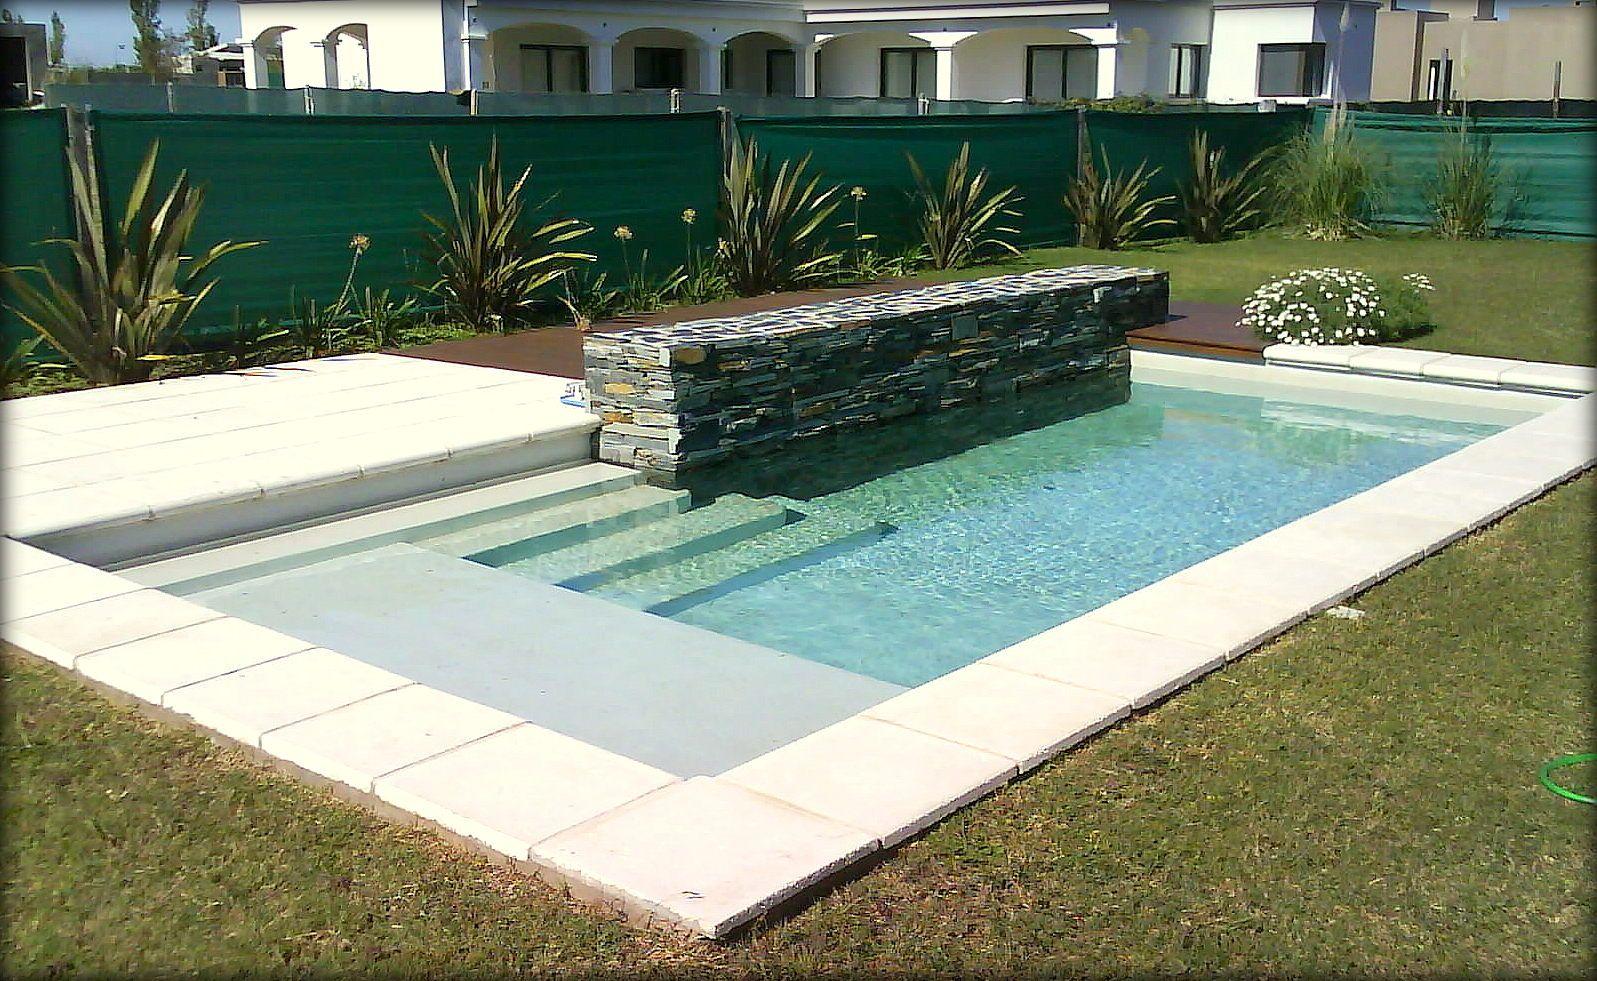 Dise o personalizados canteros revestidos en piedra deck - Piedras para piscinas ...